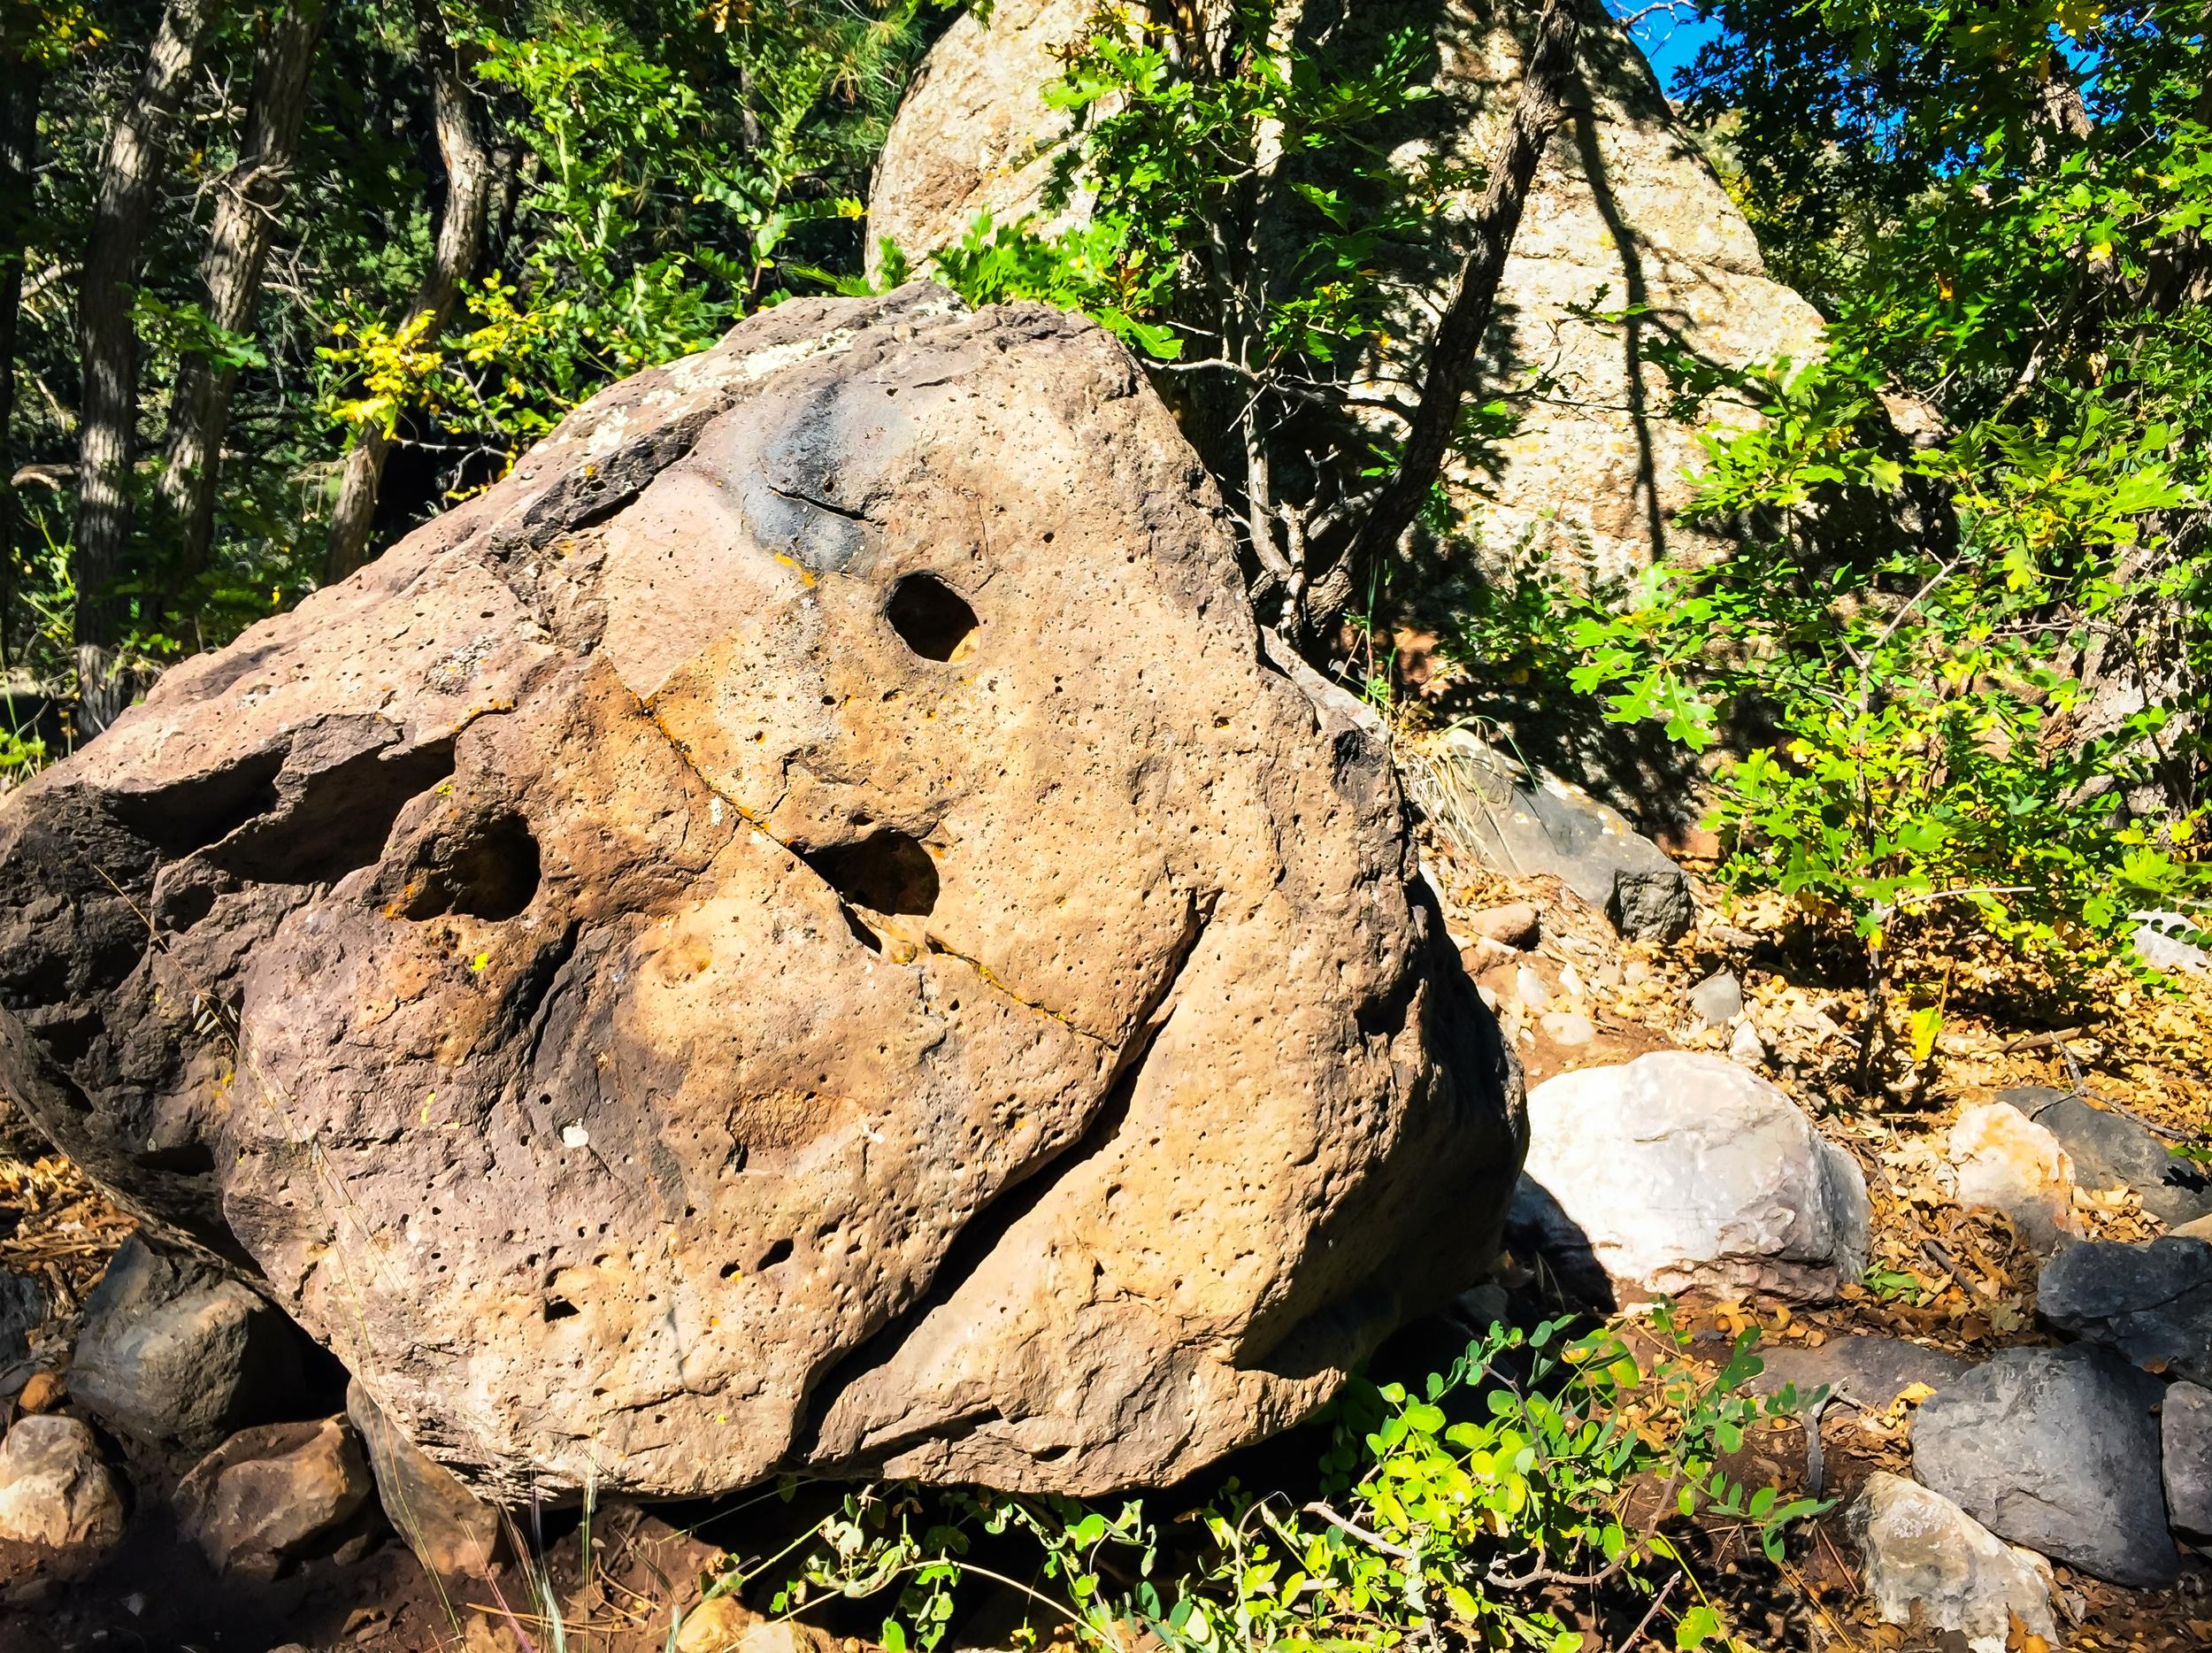 Smiley Rock